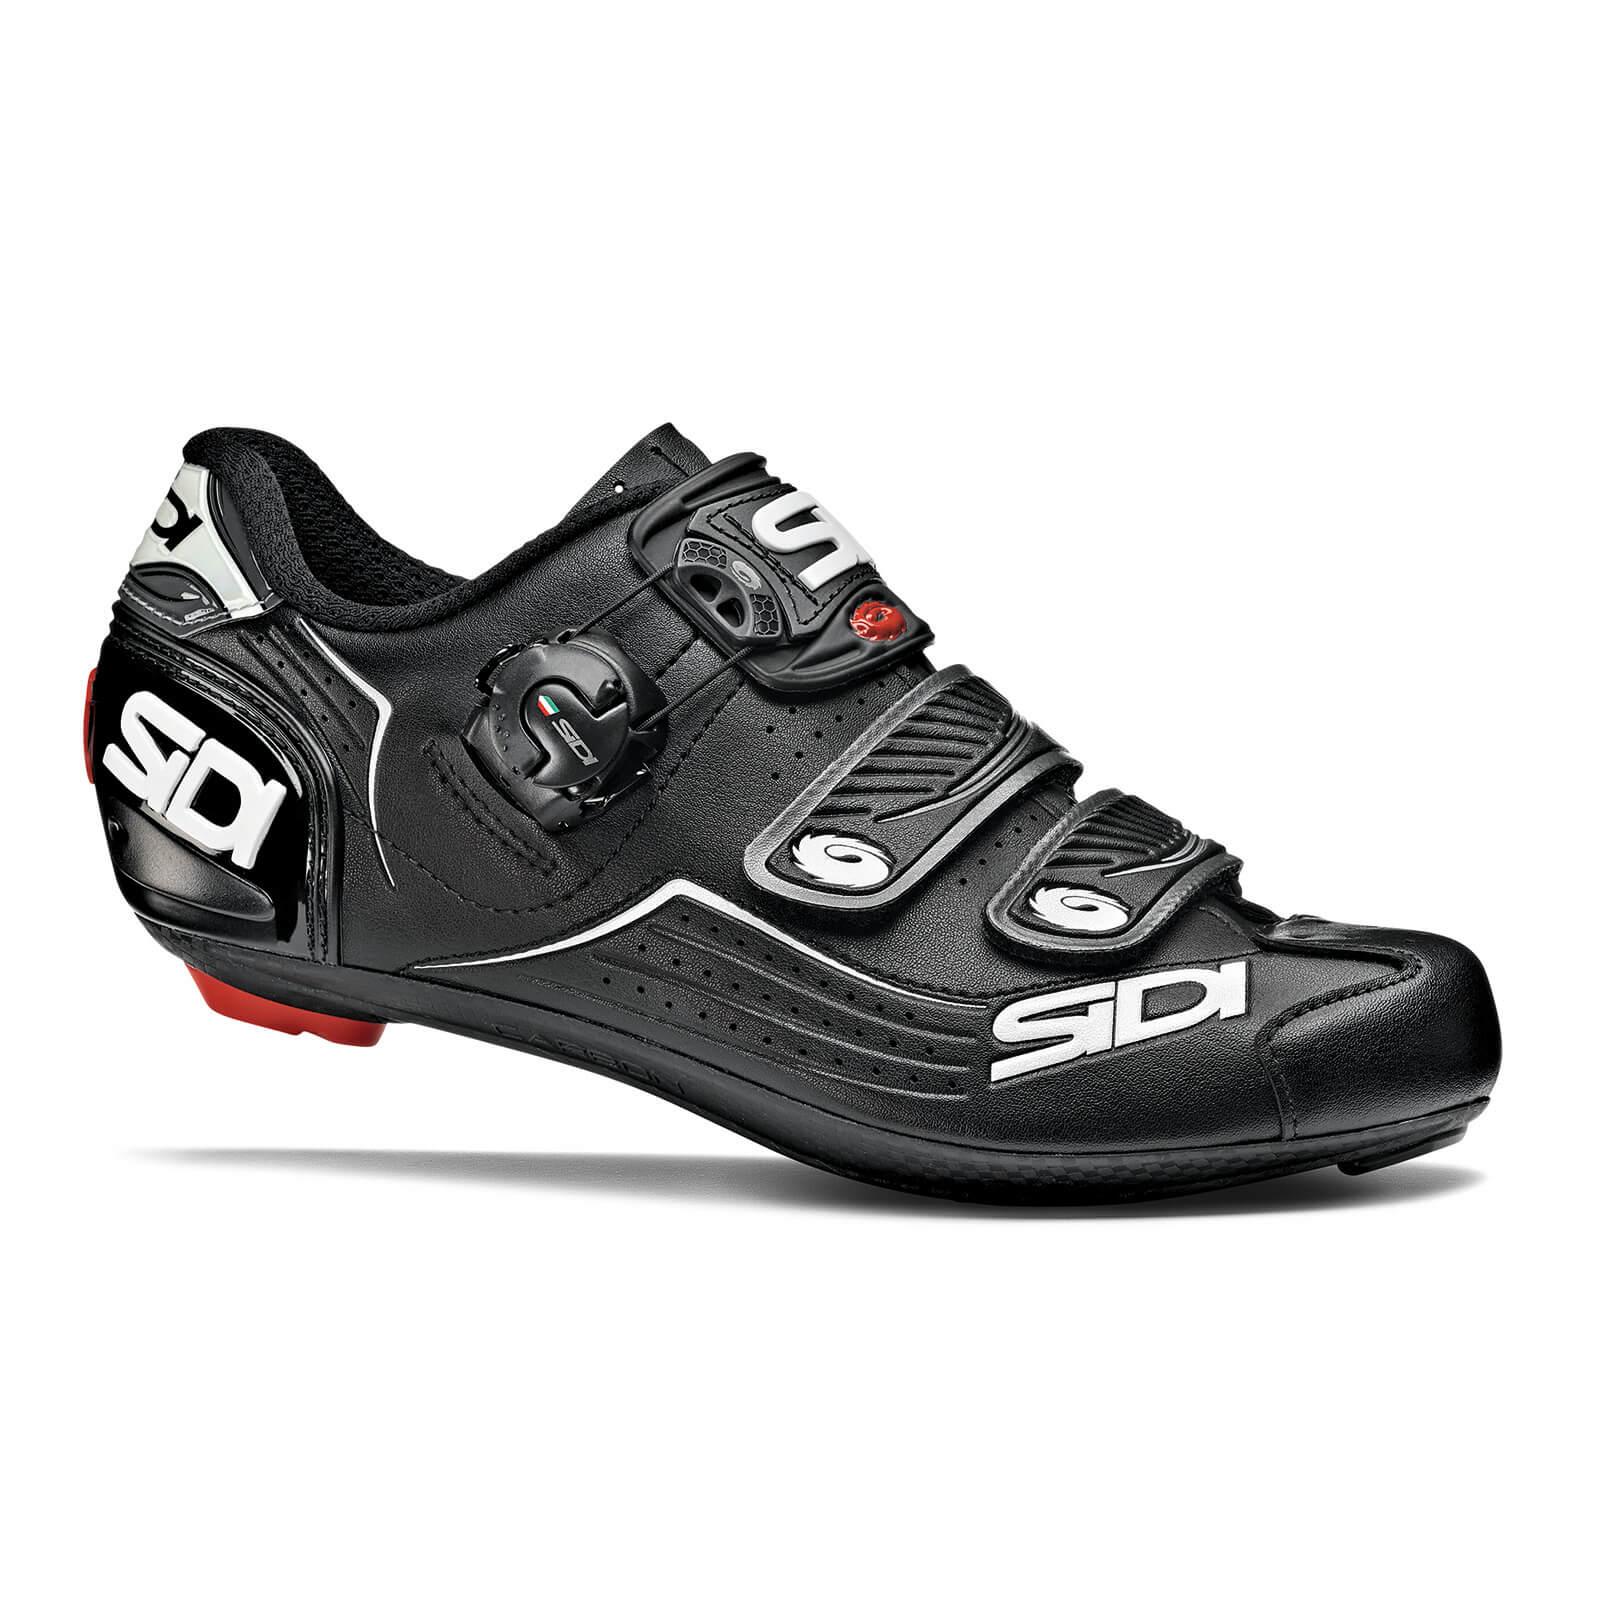 Sidi Women's Alba Road Shoes - EU 36